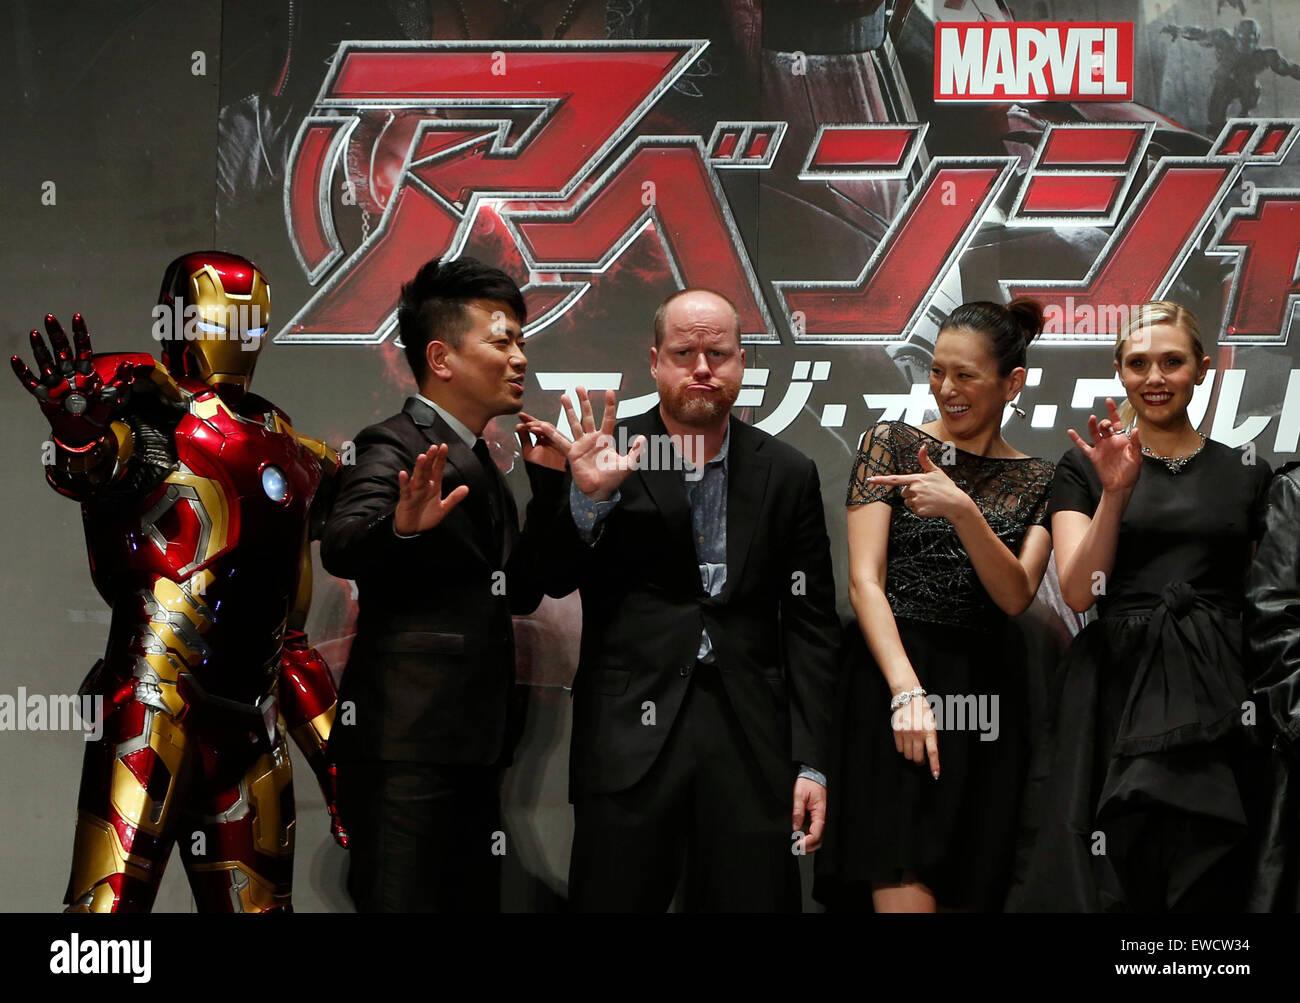 Tokyo, Japan. 23rd June, 2015. (L to R) Iron Man, Japanese comedian Hiroyuki Miyasako, film director Joss Whedon, - Stock Image